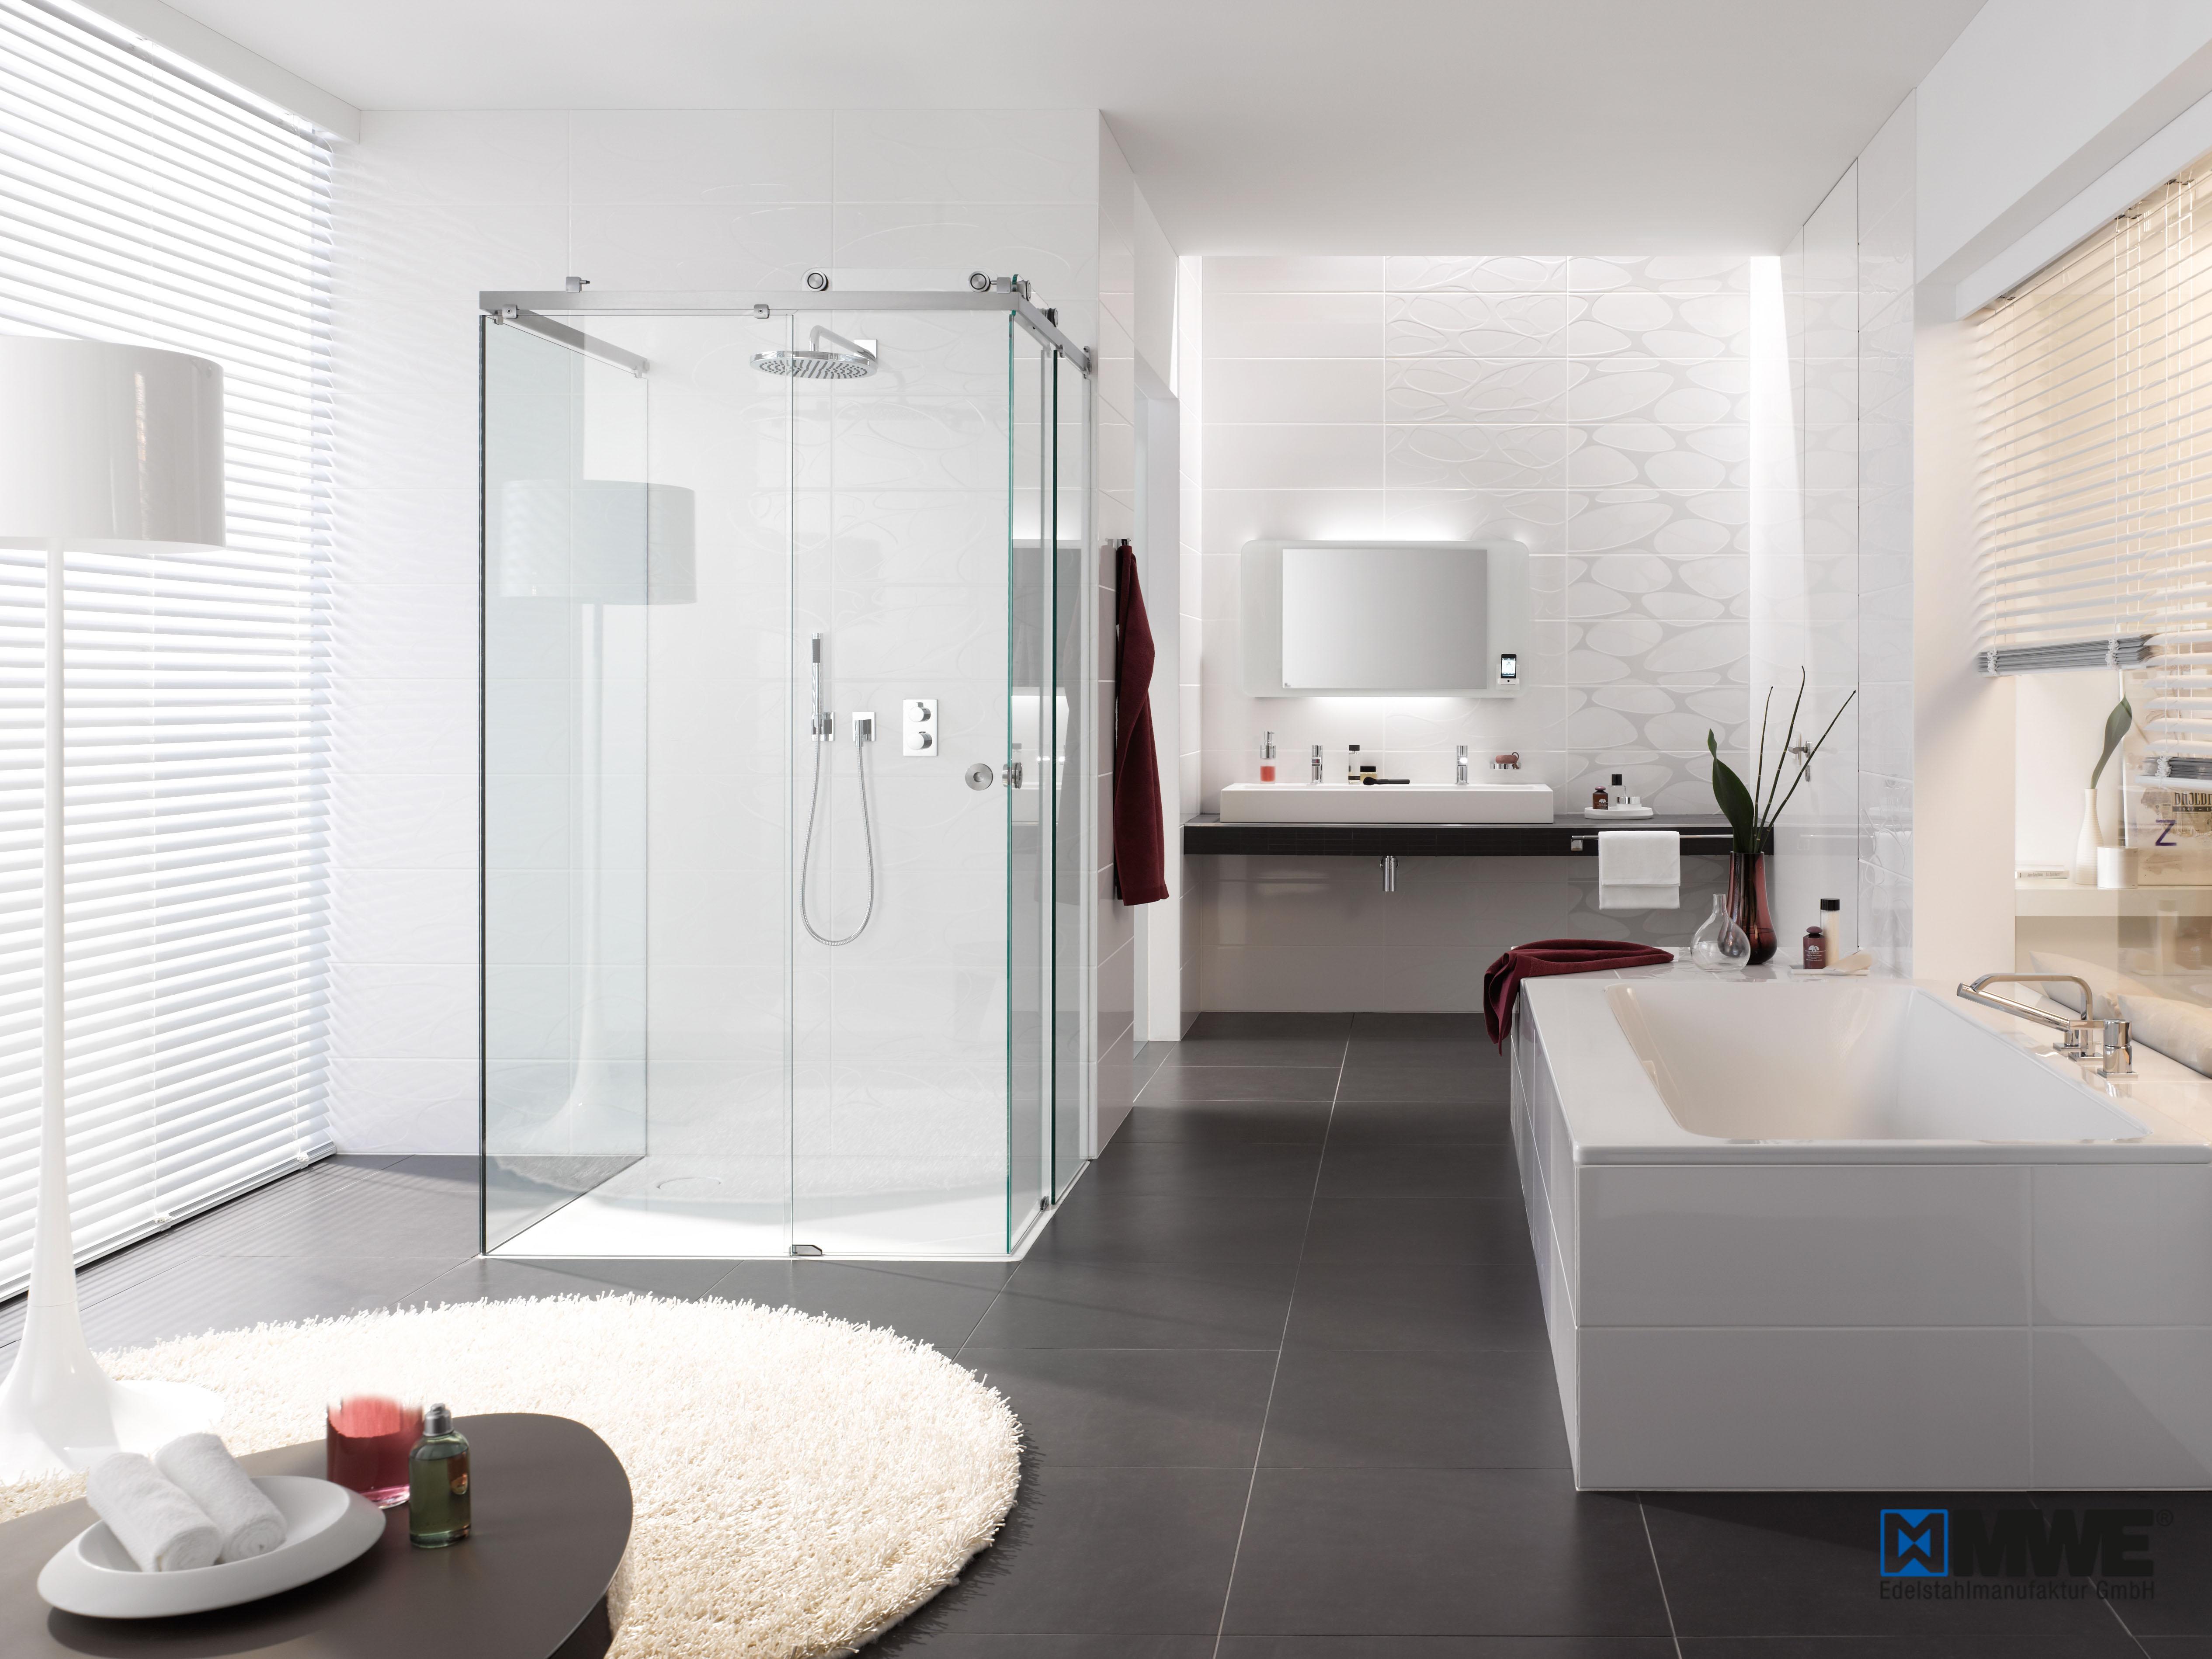 duschen glas schuhmann. Black Bedroom Furniture Sets. Home Design Ideas